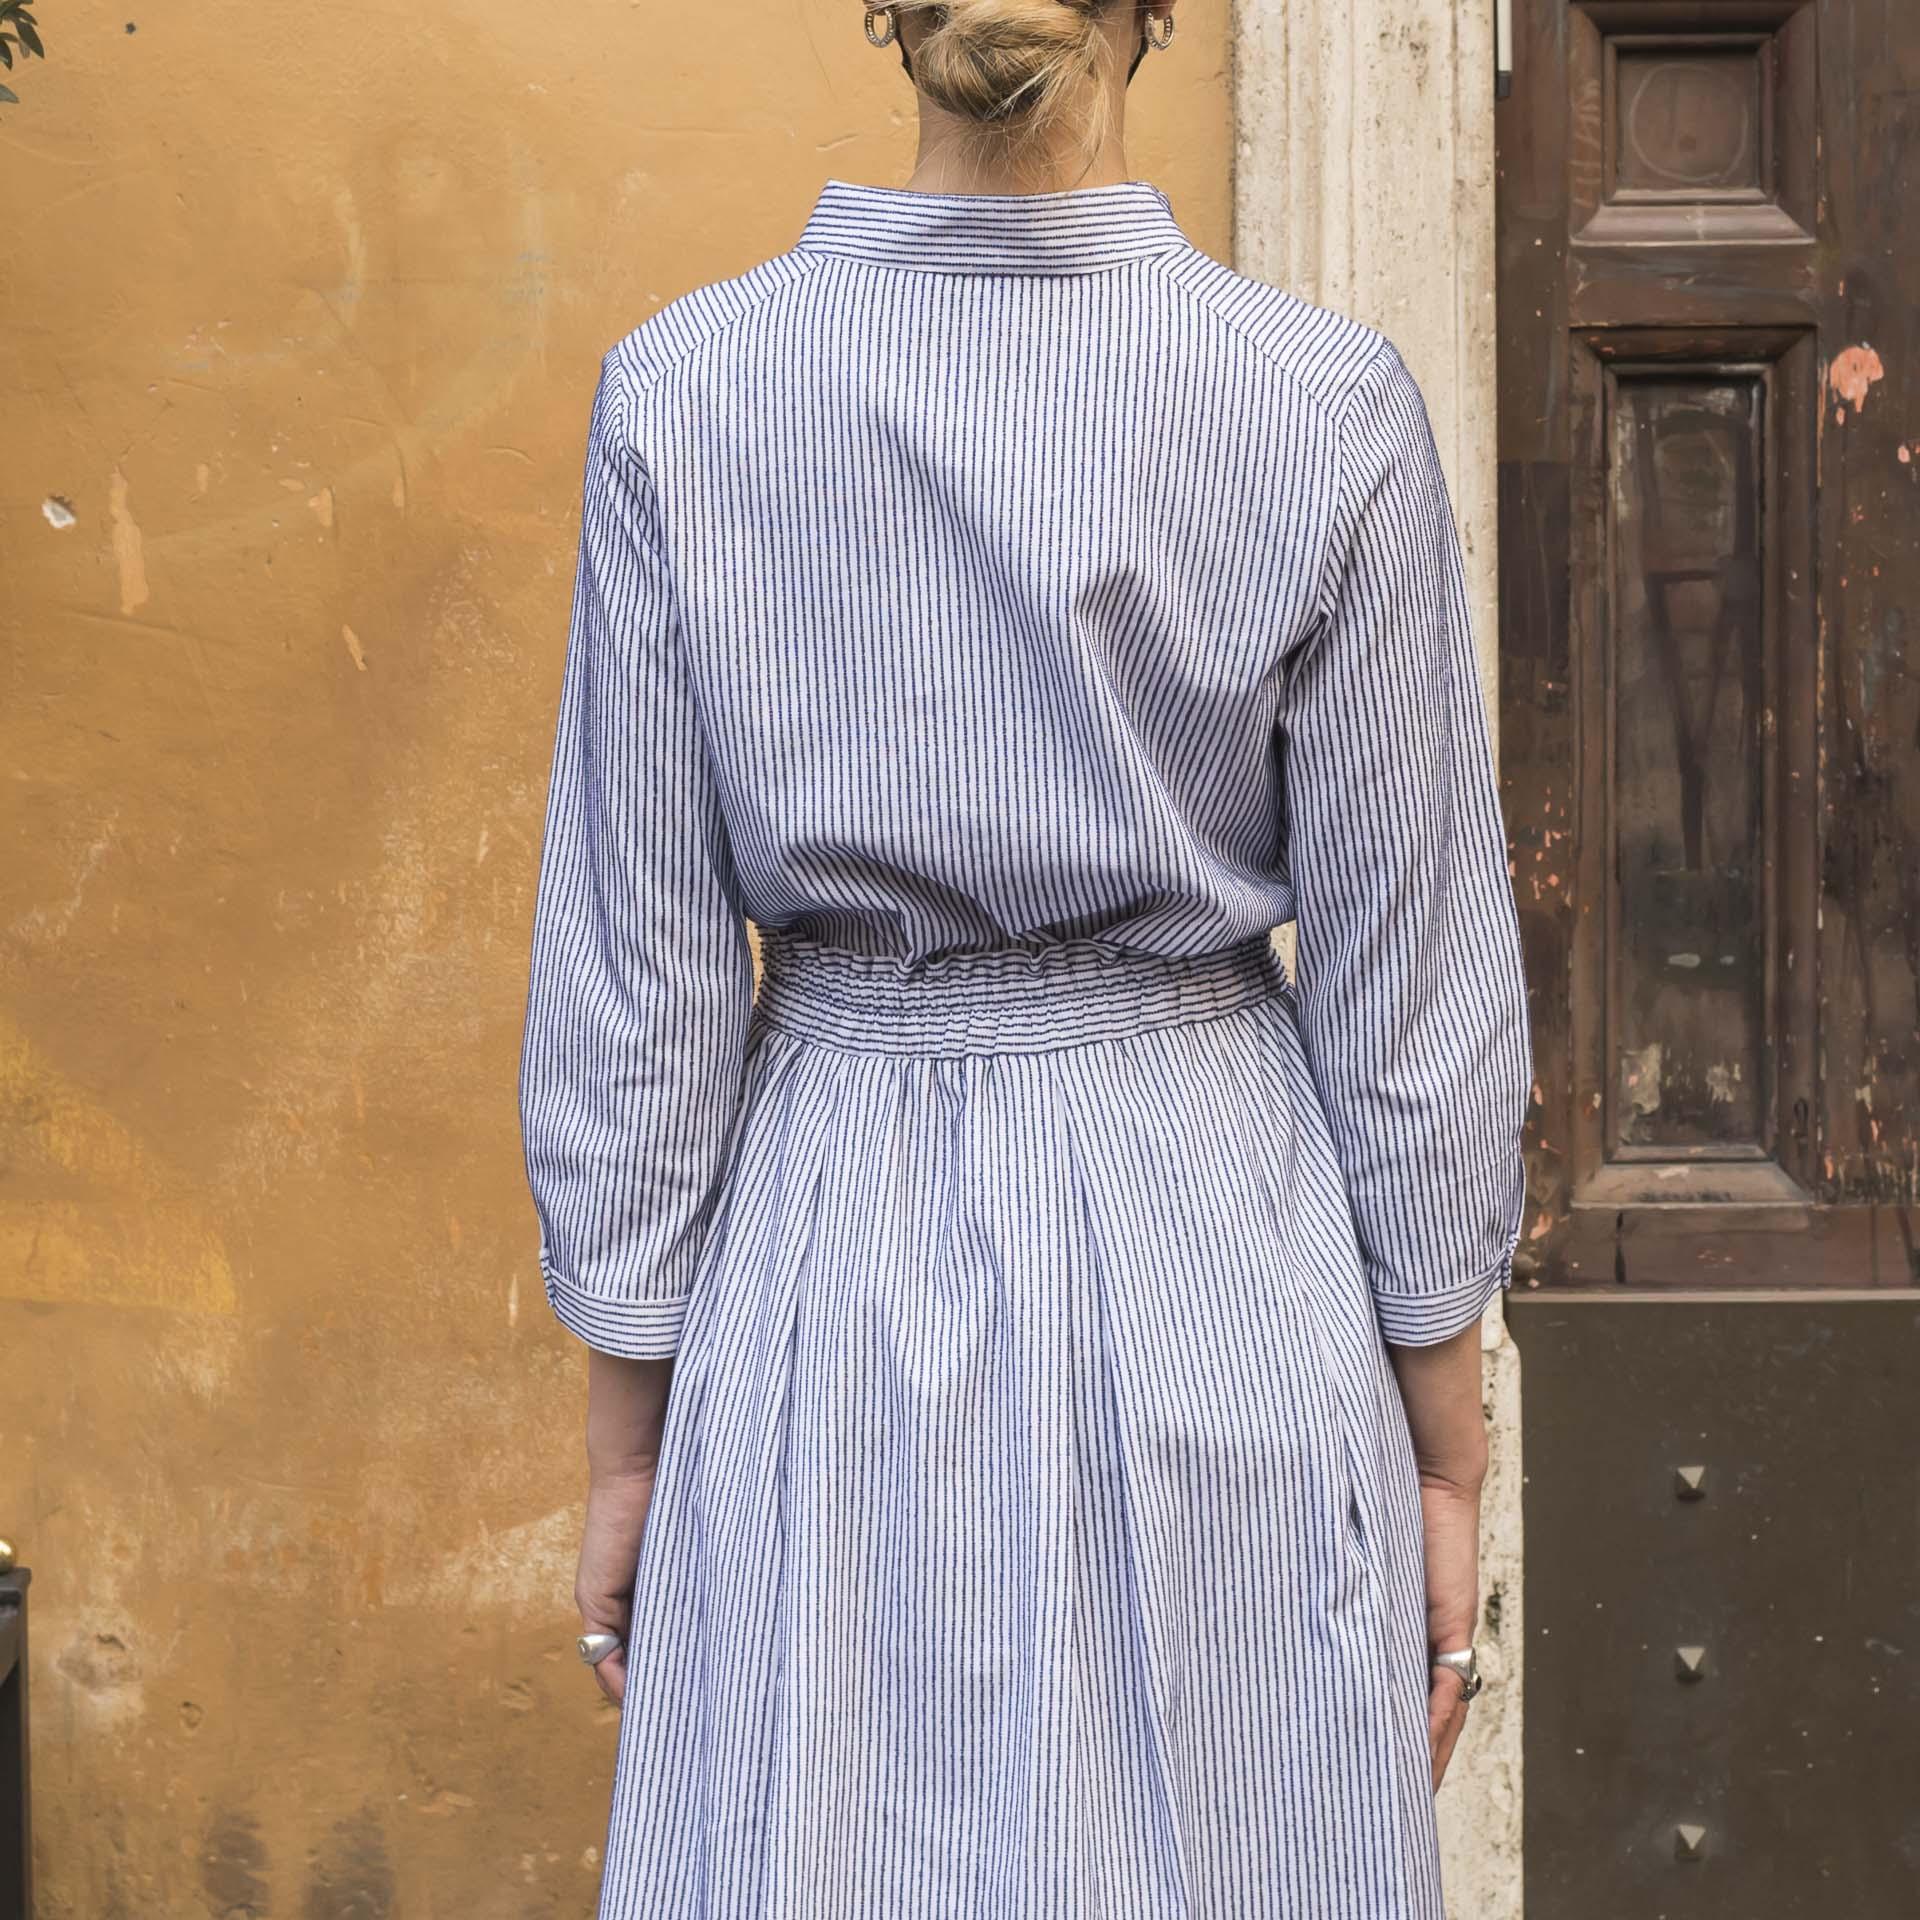 Hang On camicia slim fit twill cotone righe (1)